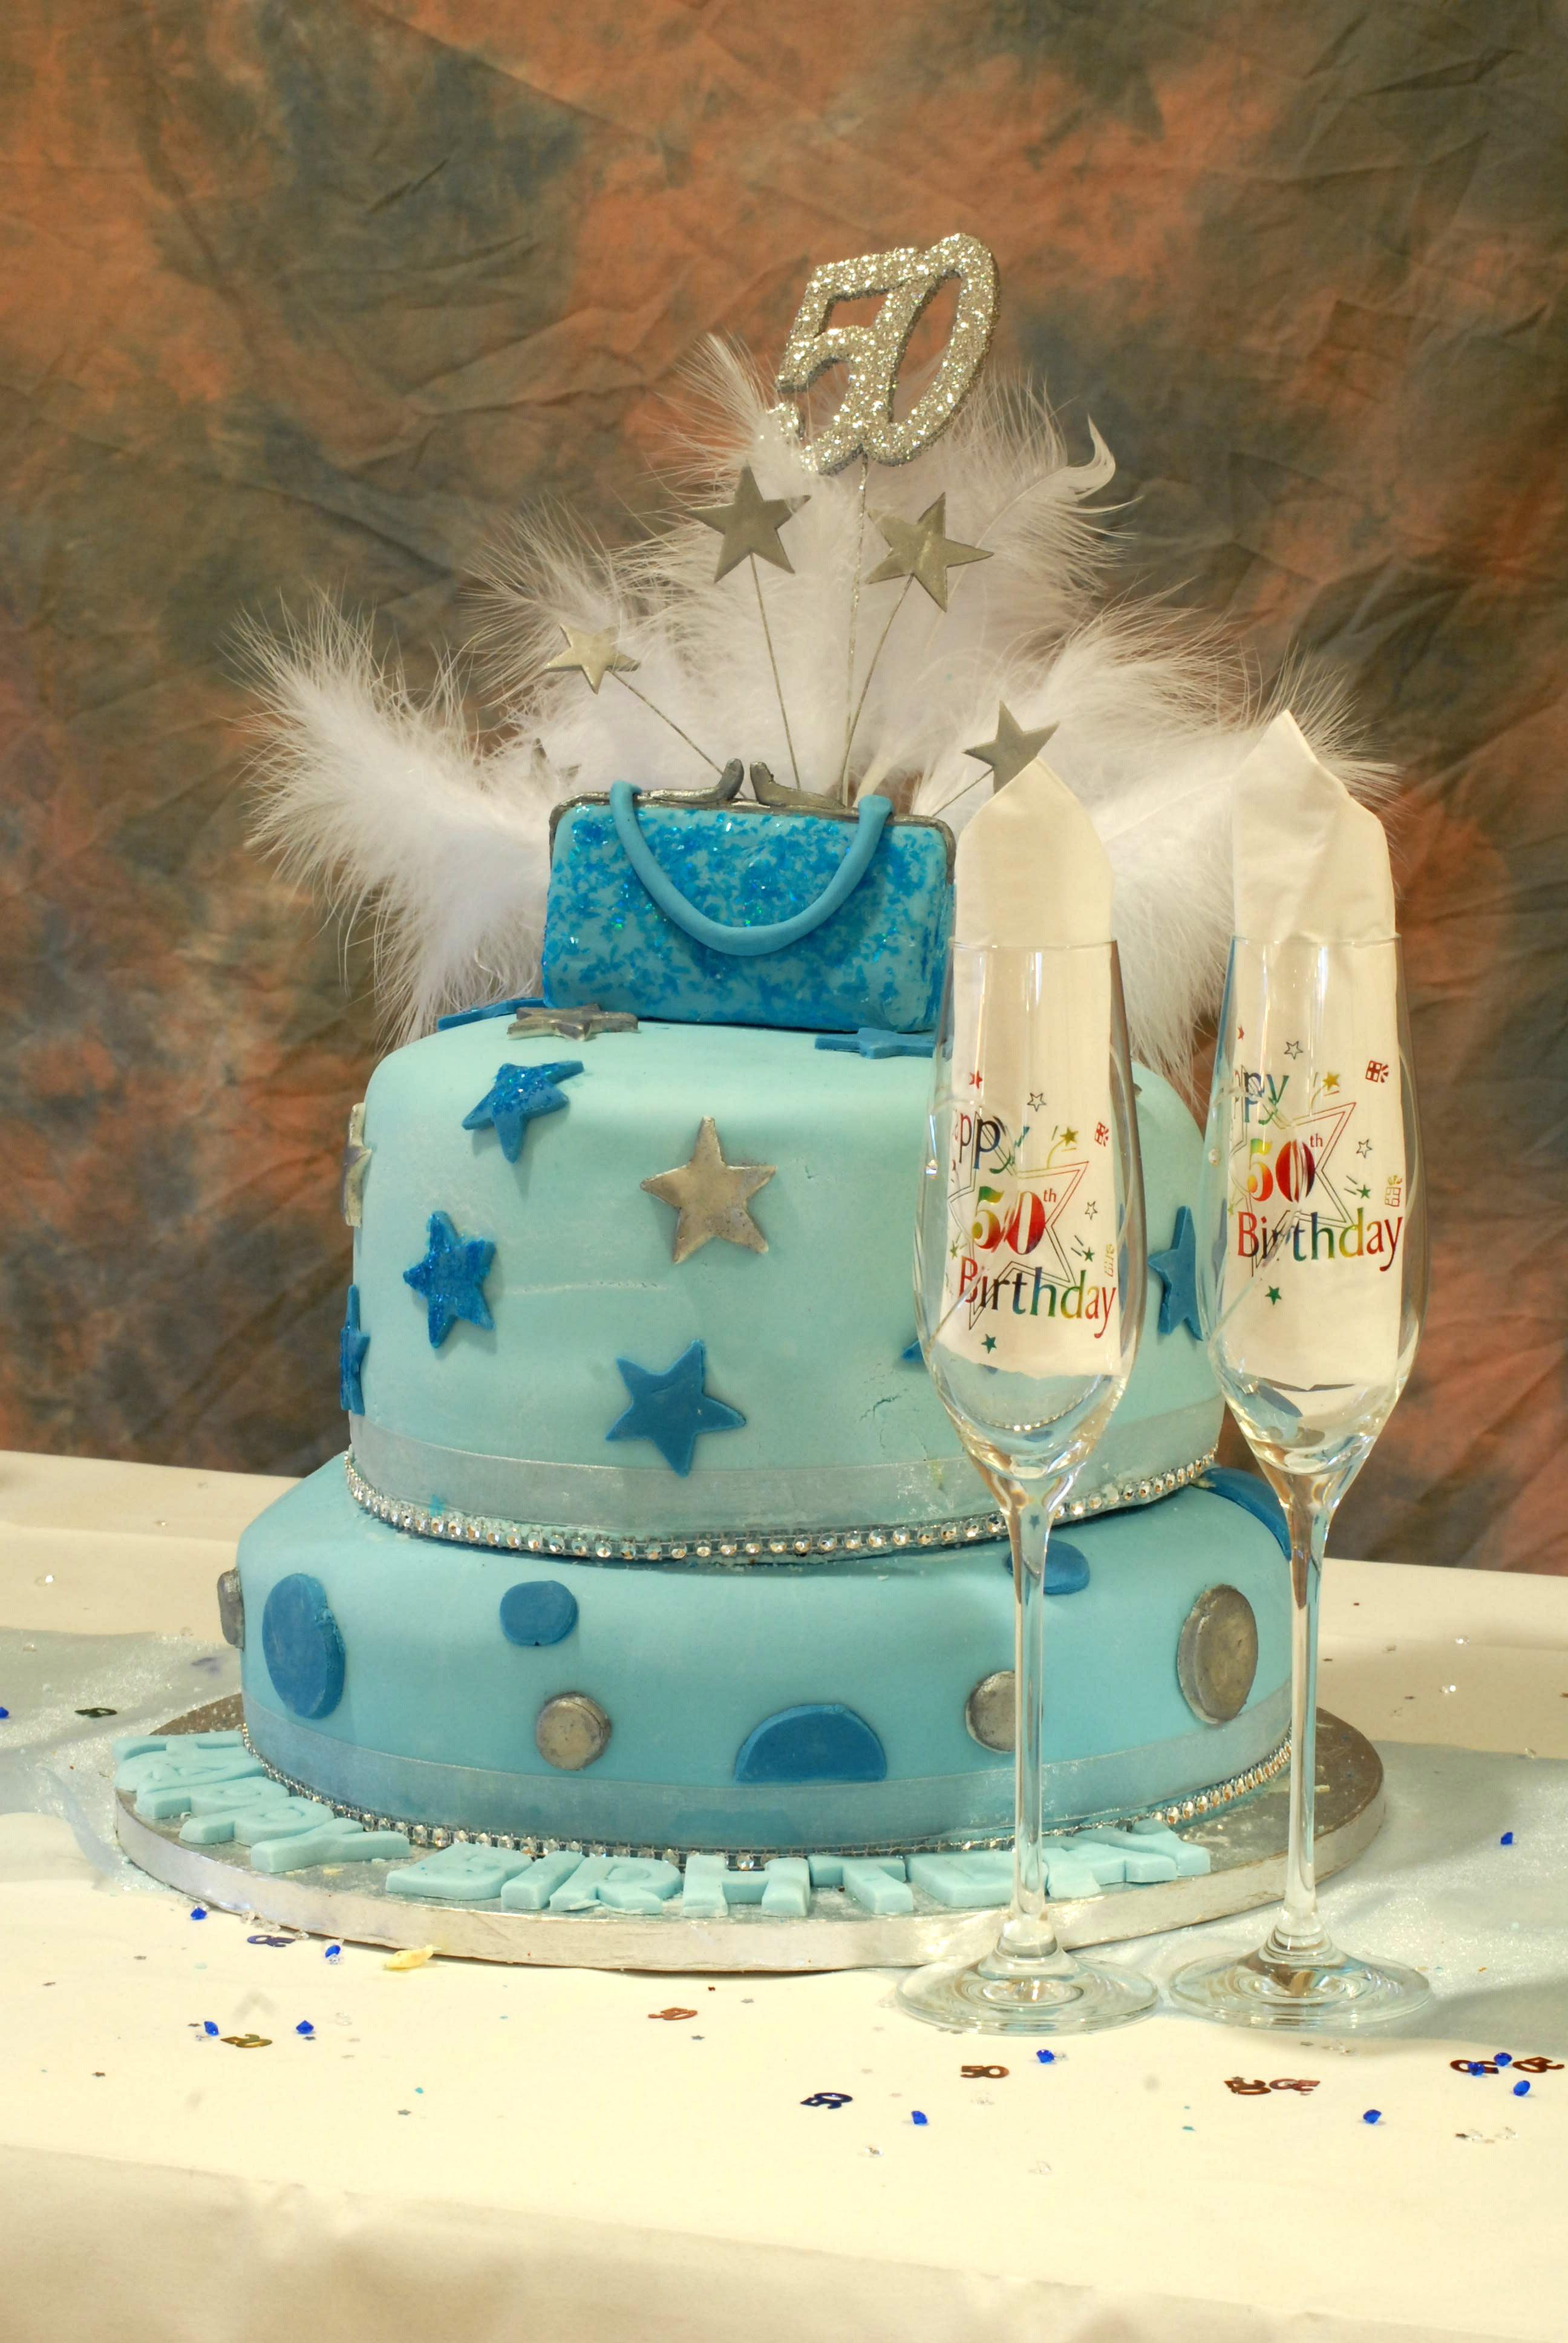 Free Images Celebration Food Blue Dessert Celebrate Birthday